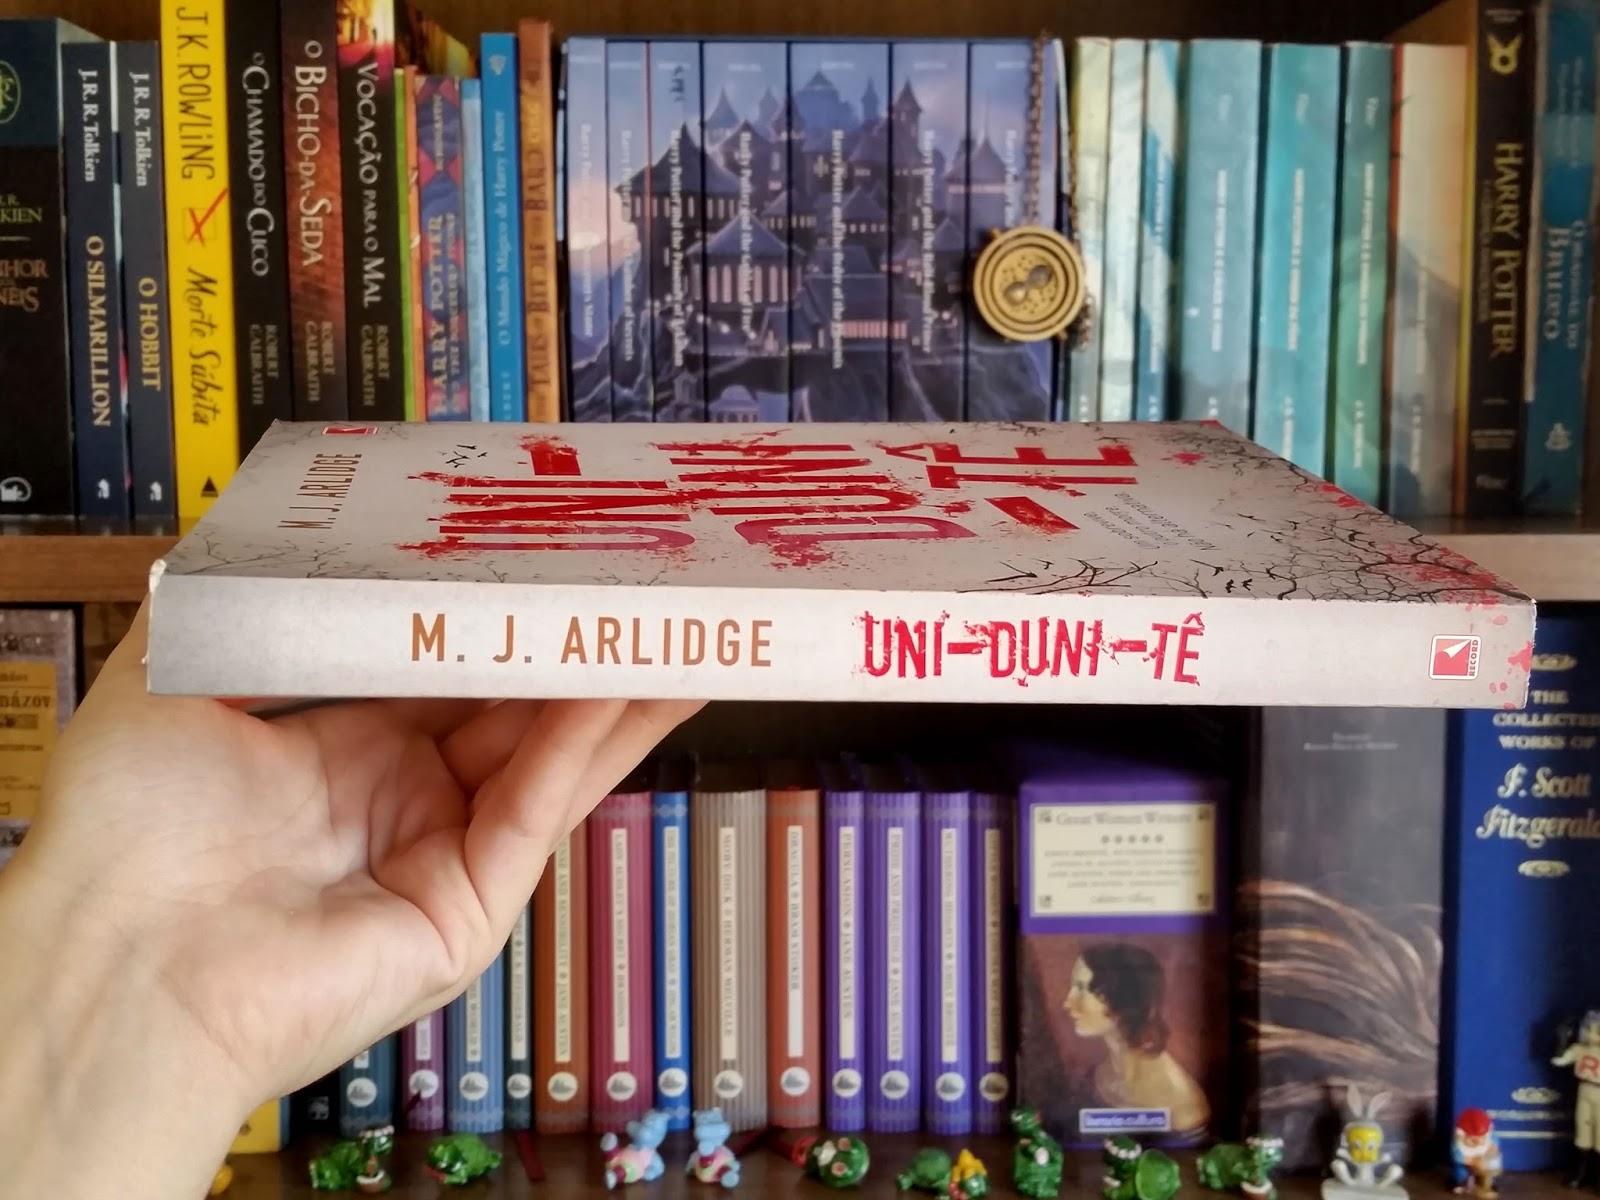 Livro Uni-Duni-Tê